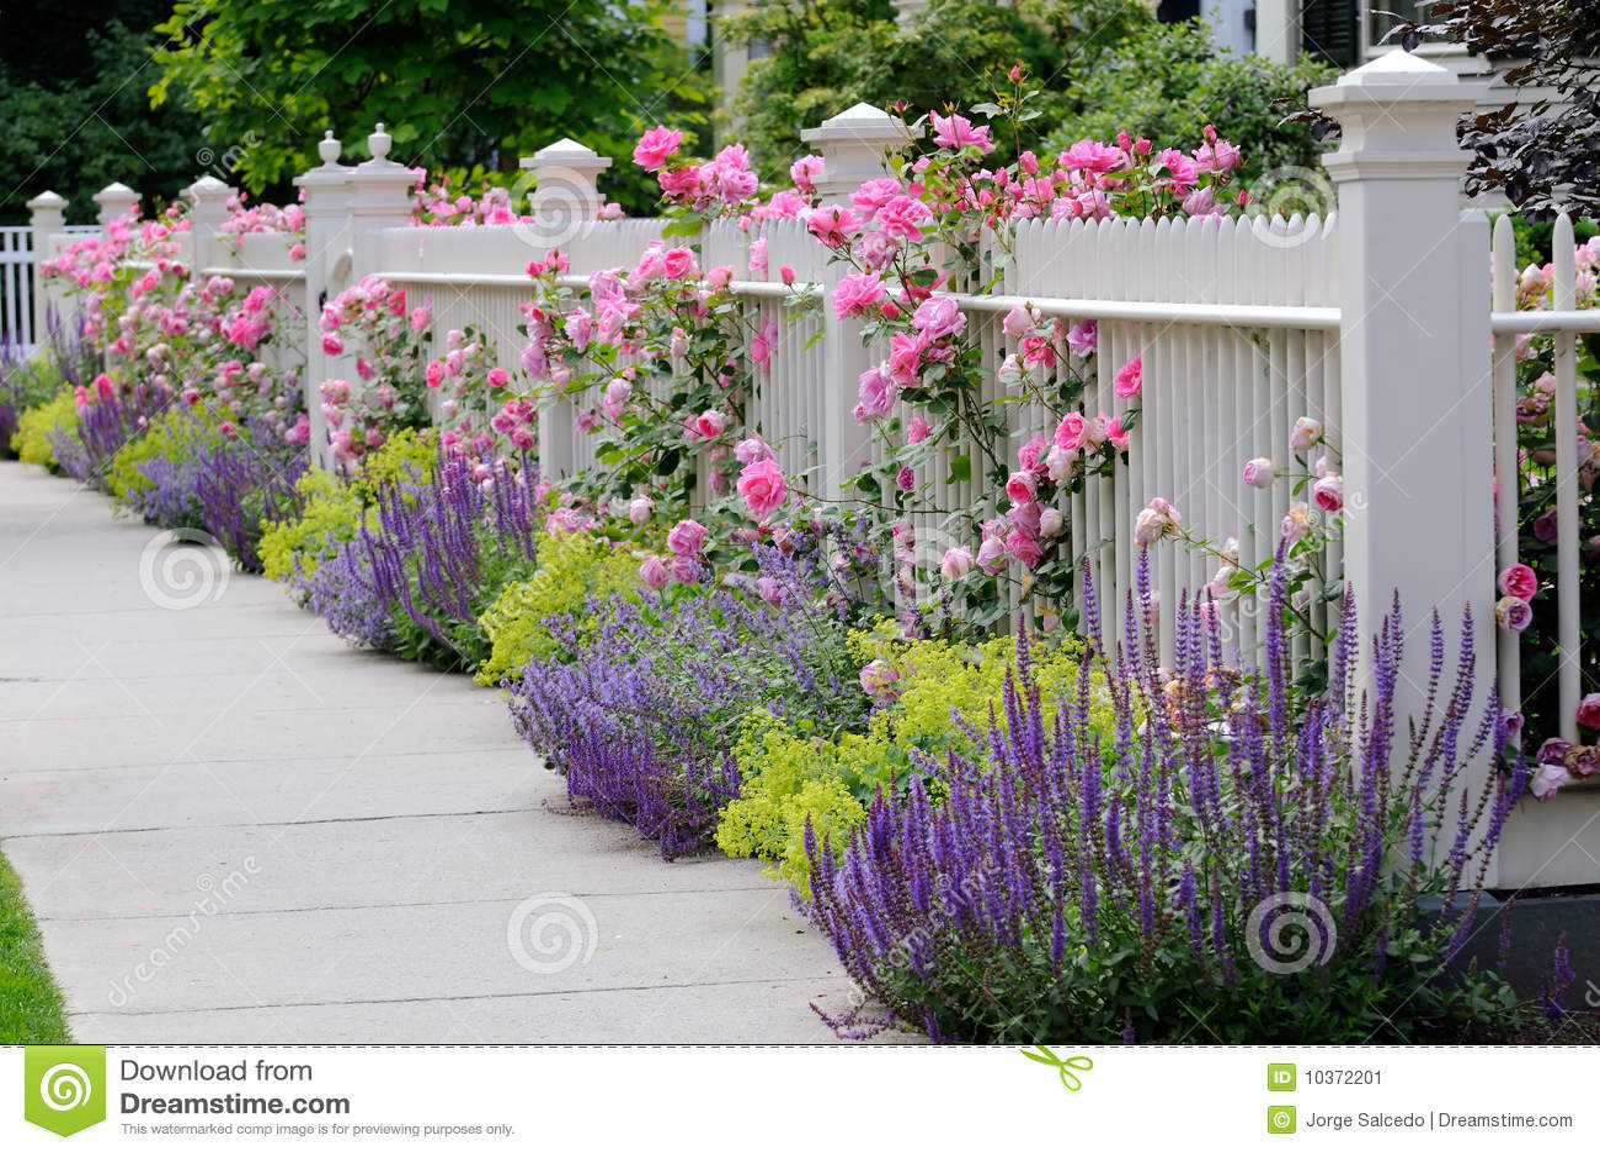 steigende rosen wei er zaun stockbild bild von bett nave 10372201. Black Bedroom Furniture Sets. Home Design Ideas